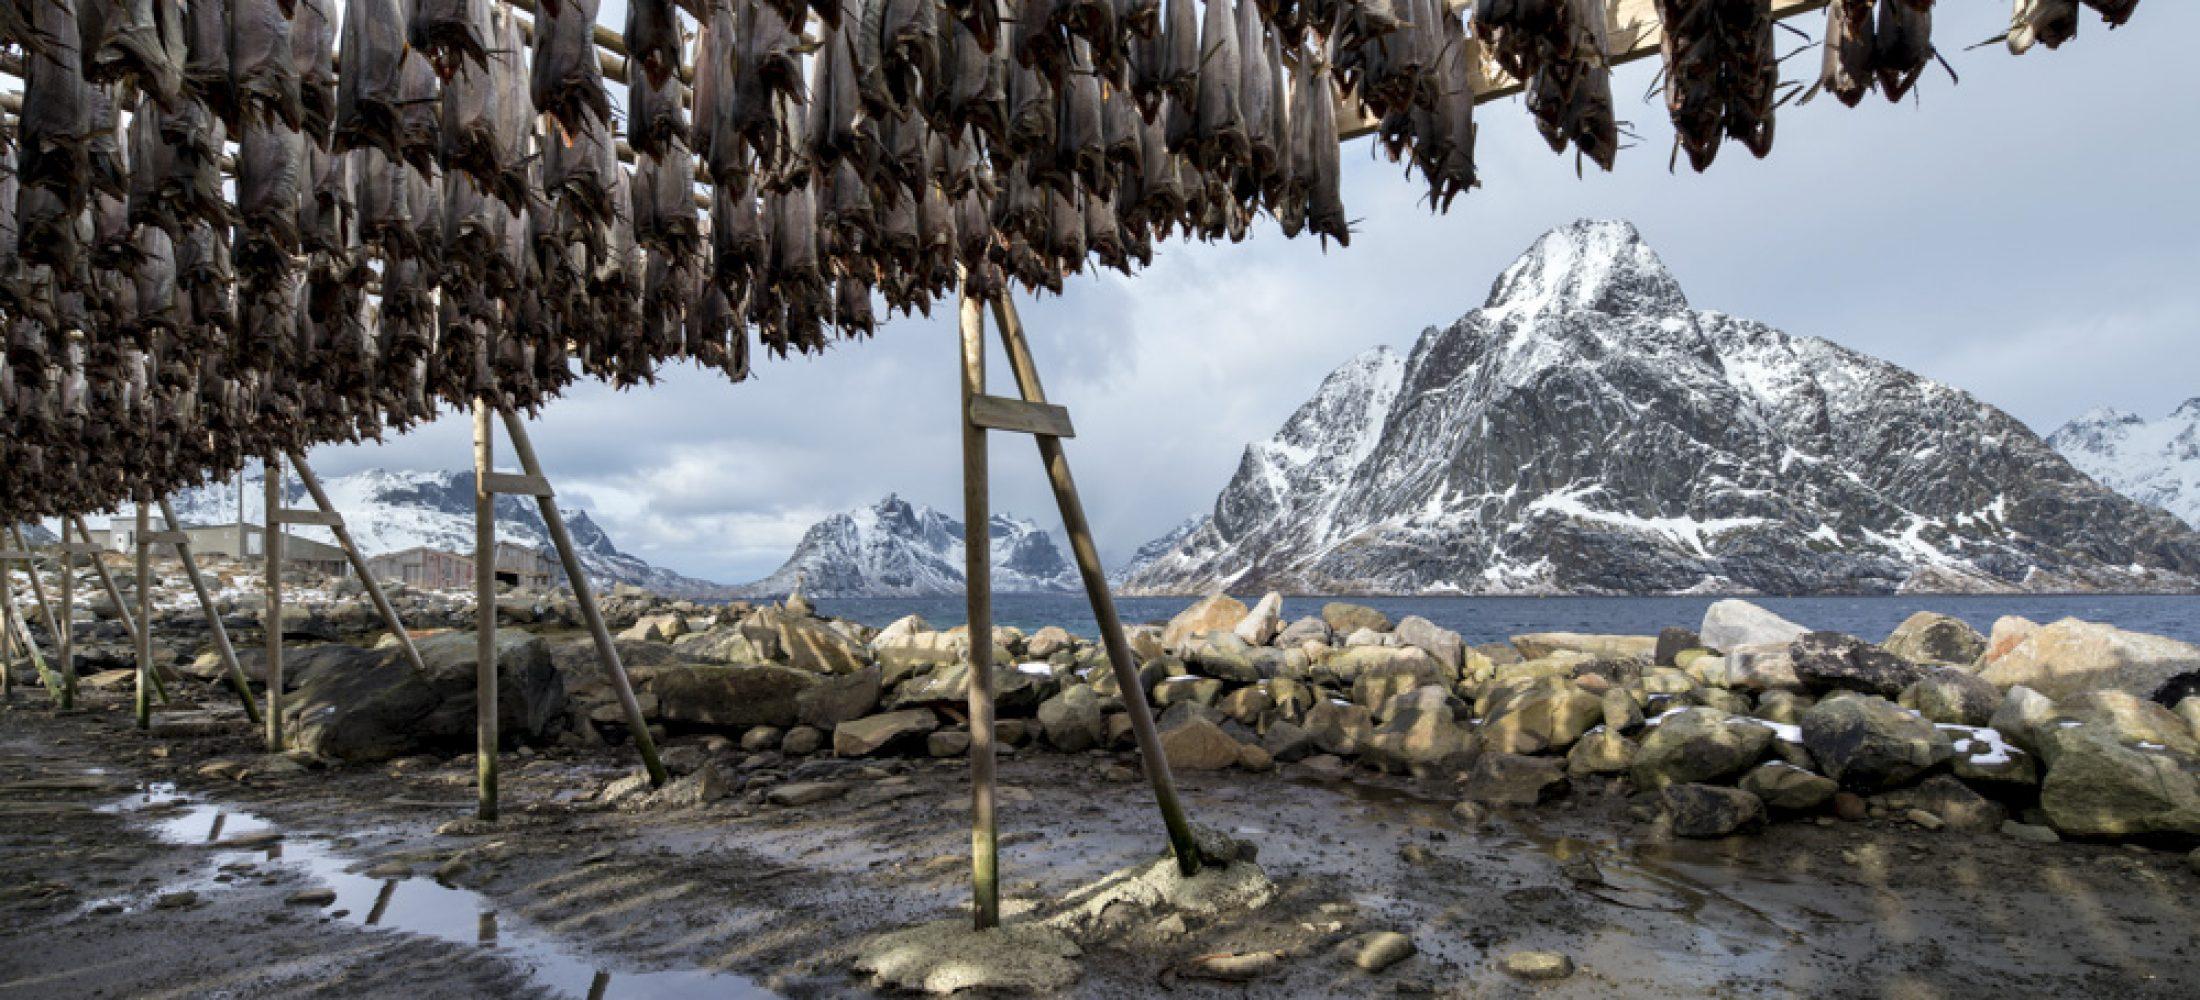 Stockfish at Reine